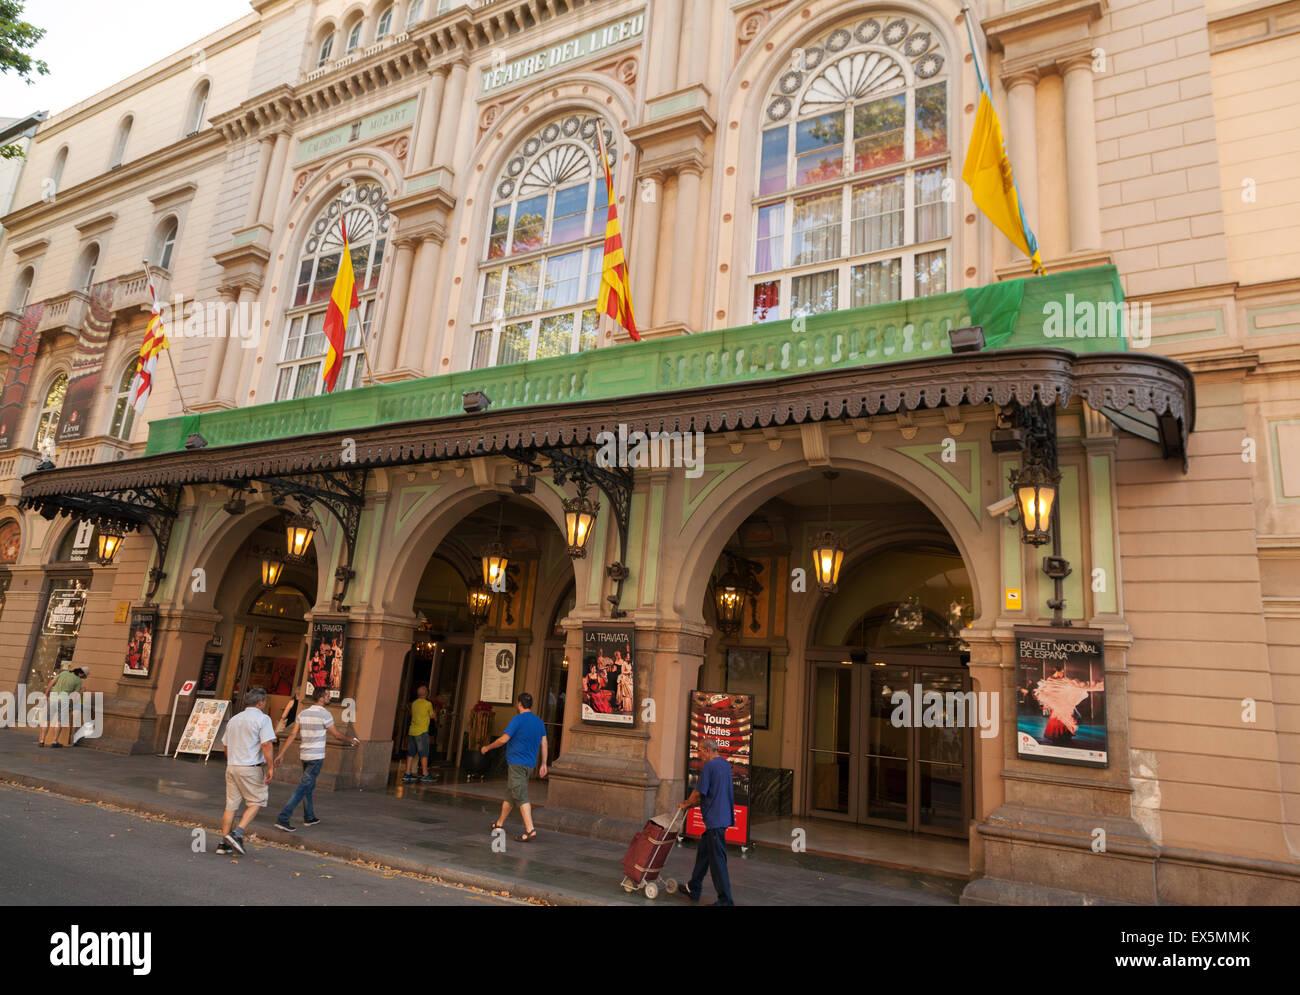 The Gran Teatre del Liceu, Las Ramblas, Barcelona Spain Europe - Stock Image